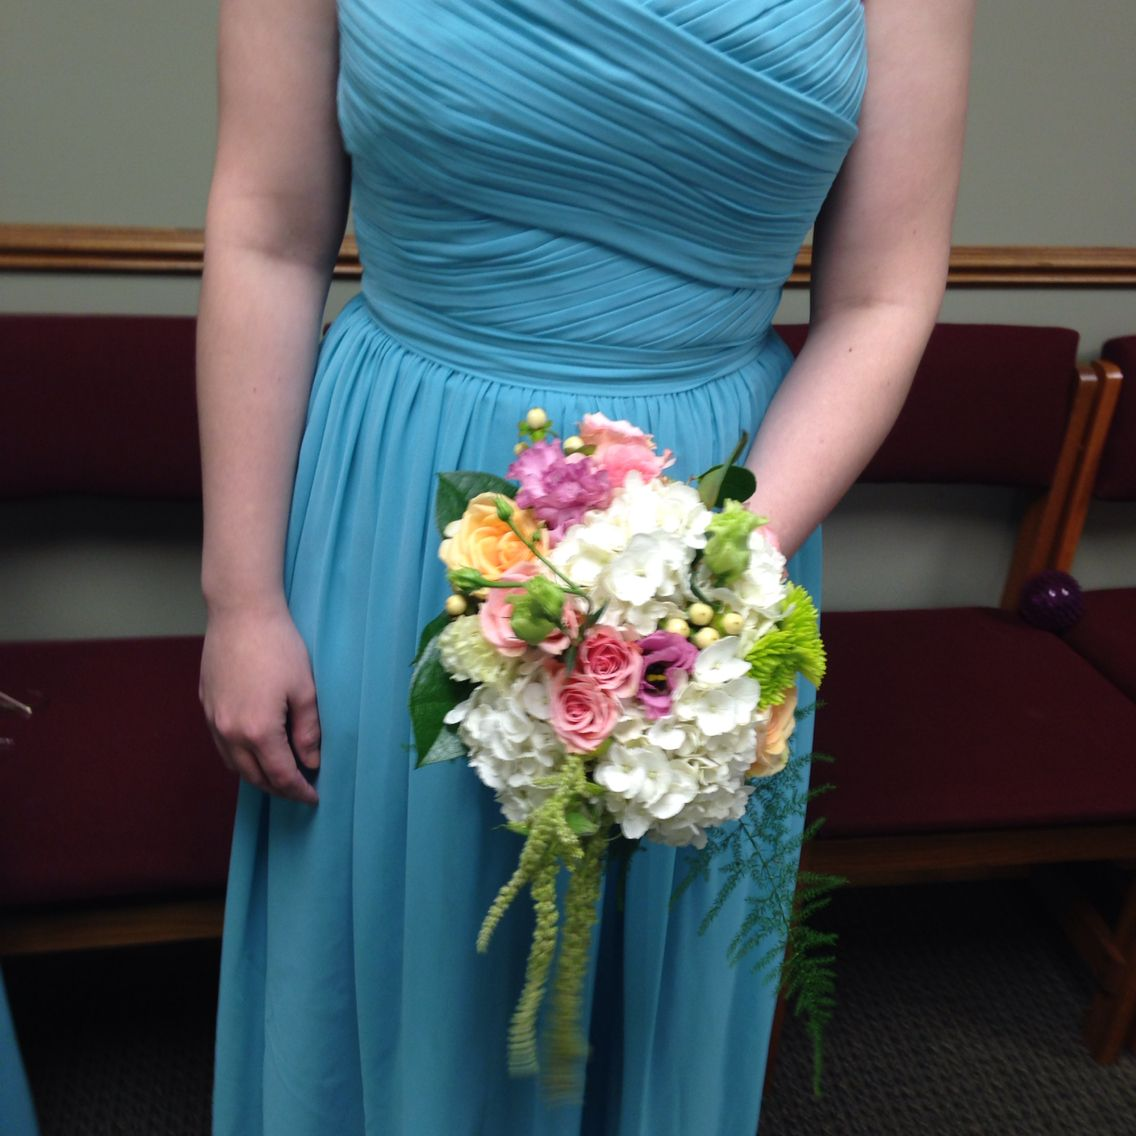 Tattered Leaf Designs flowers & gifts bridesmaid bouquet for Aqua dresses#peachbiuquets